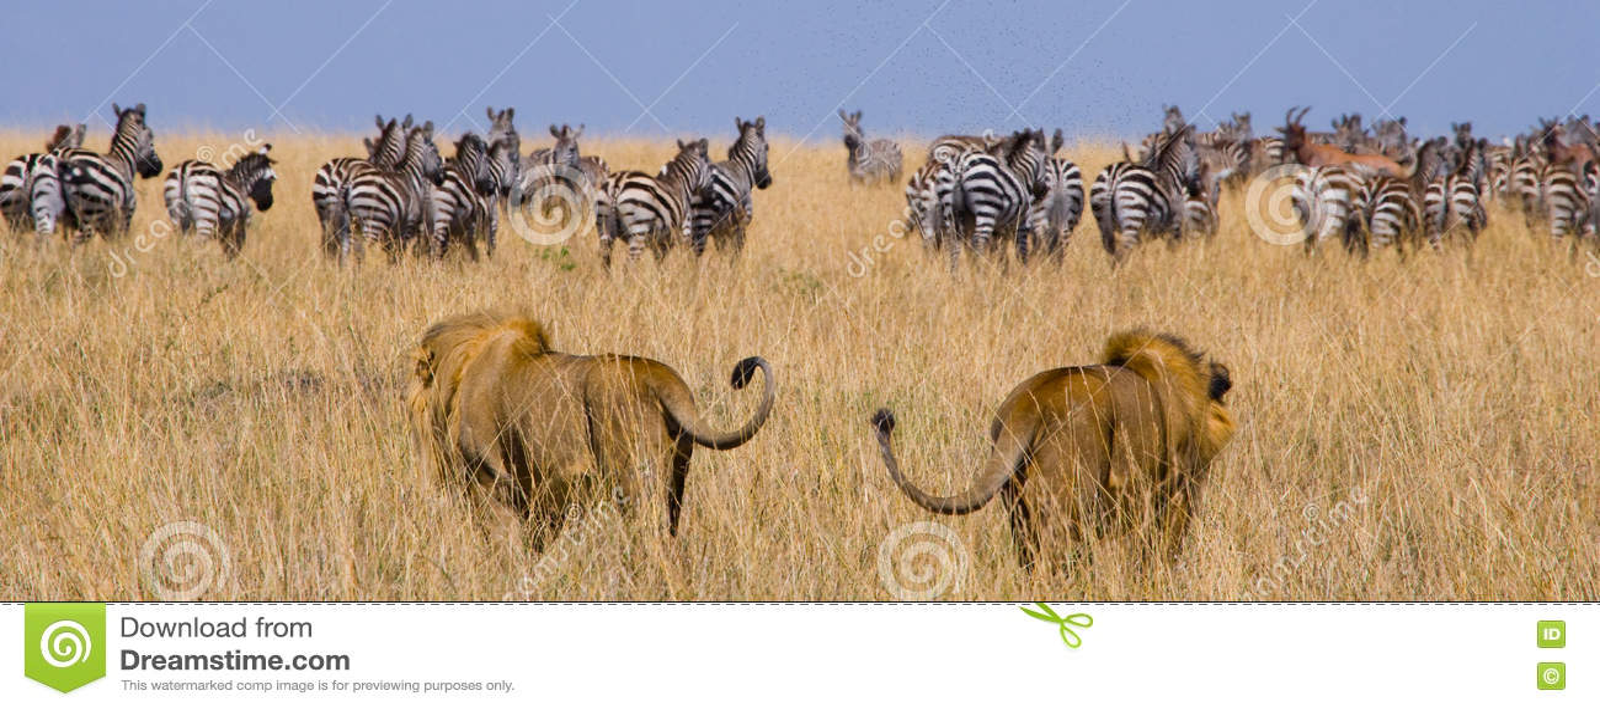 Due grandi leoni maschii sulla caccia Sosta nazionale kenya tanzania Masai Mara serengeti